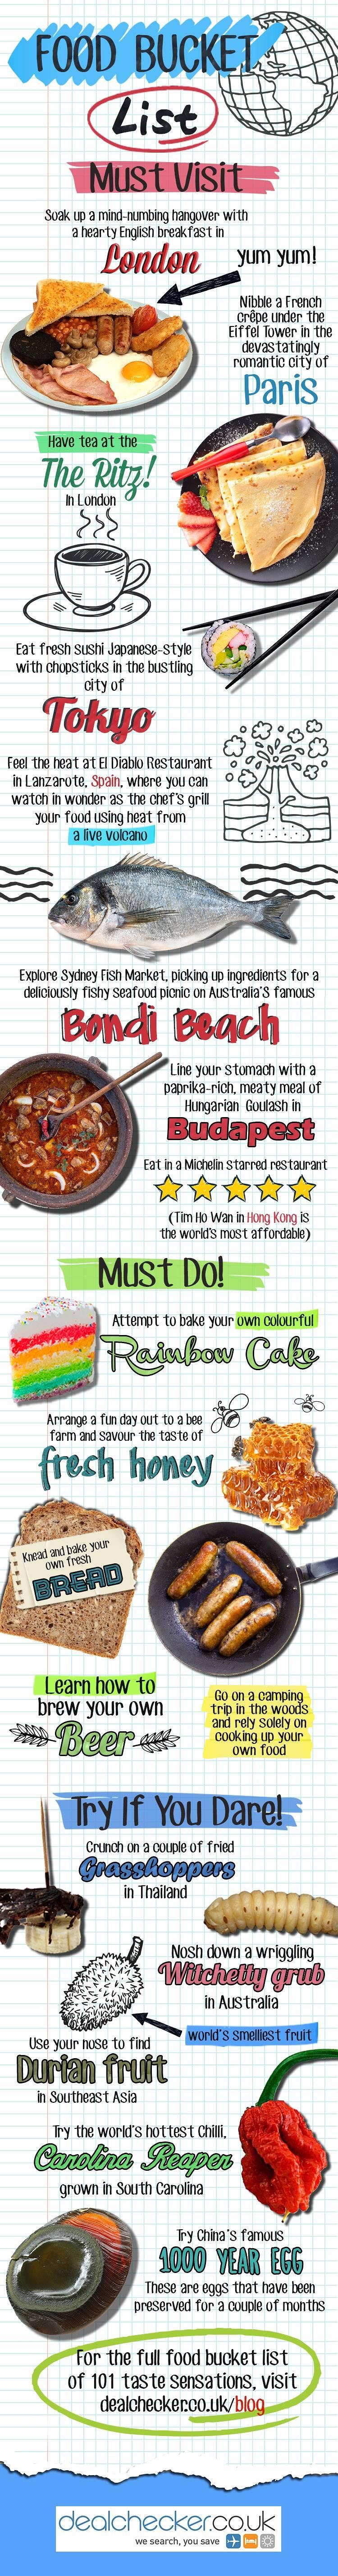 Food Bucket List Graphic